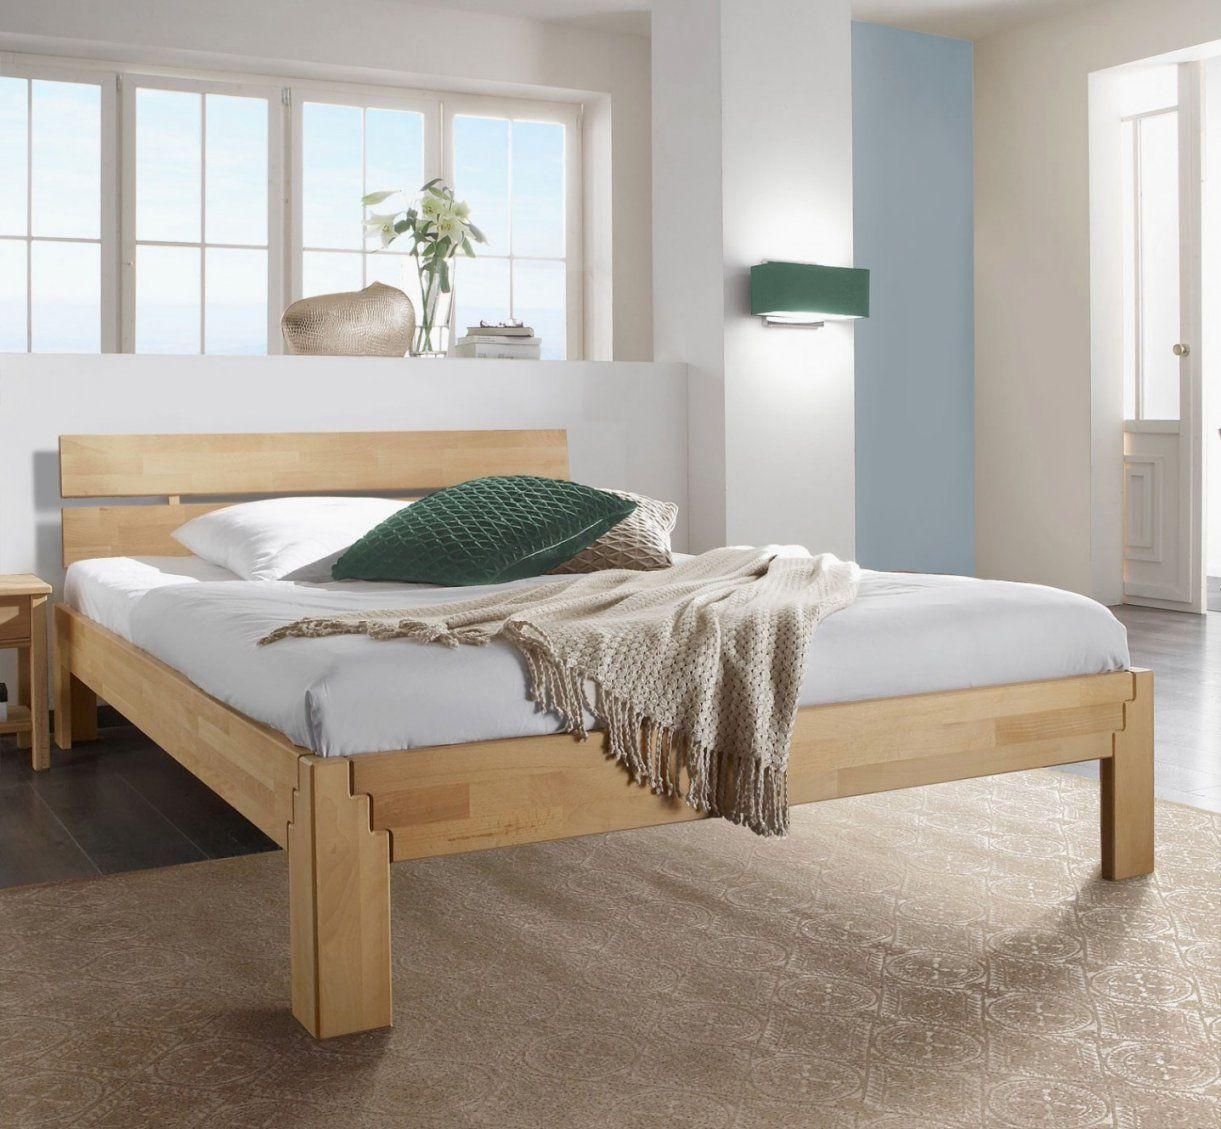 bett ideen selber bauen haus design ideen. Black Bedroom Furniture Sets. Home Design Ideas